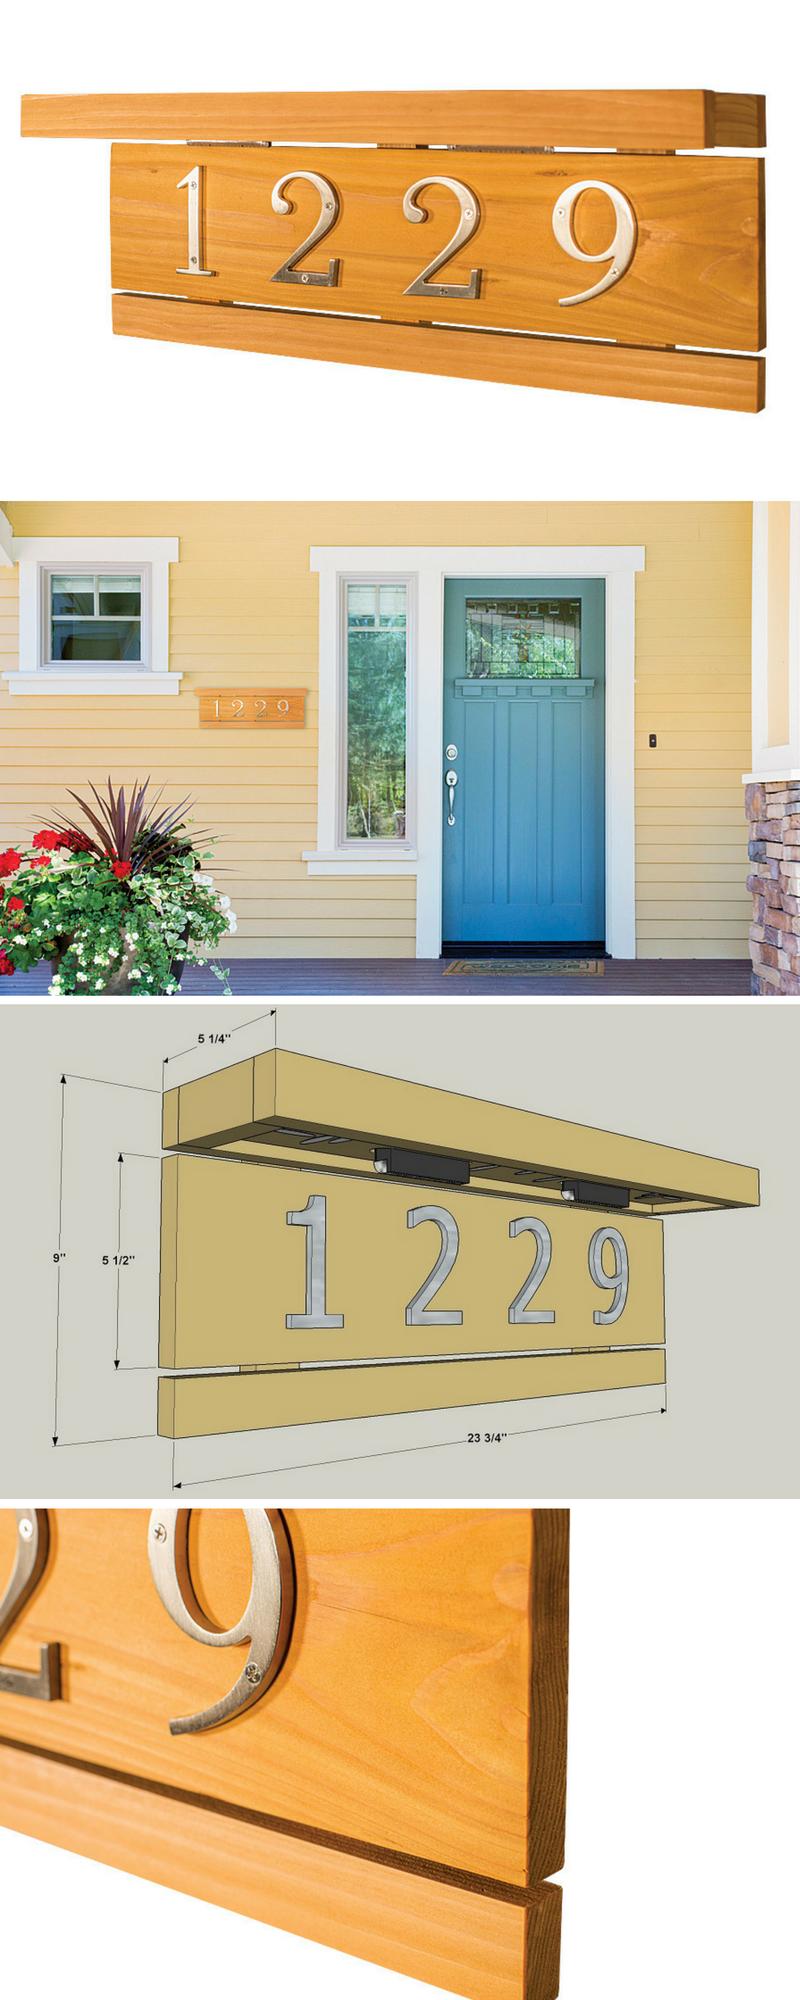 How to build a DIY Custom Lighted Address Plaque   Get the free ...